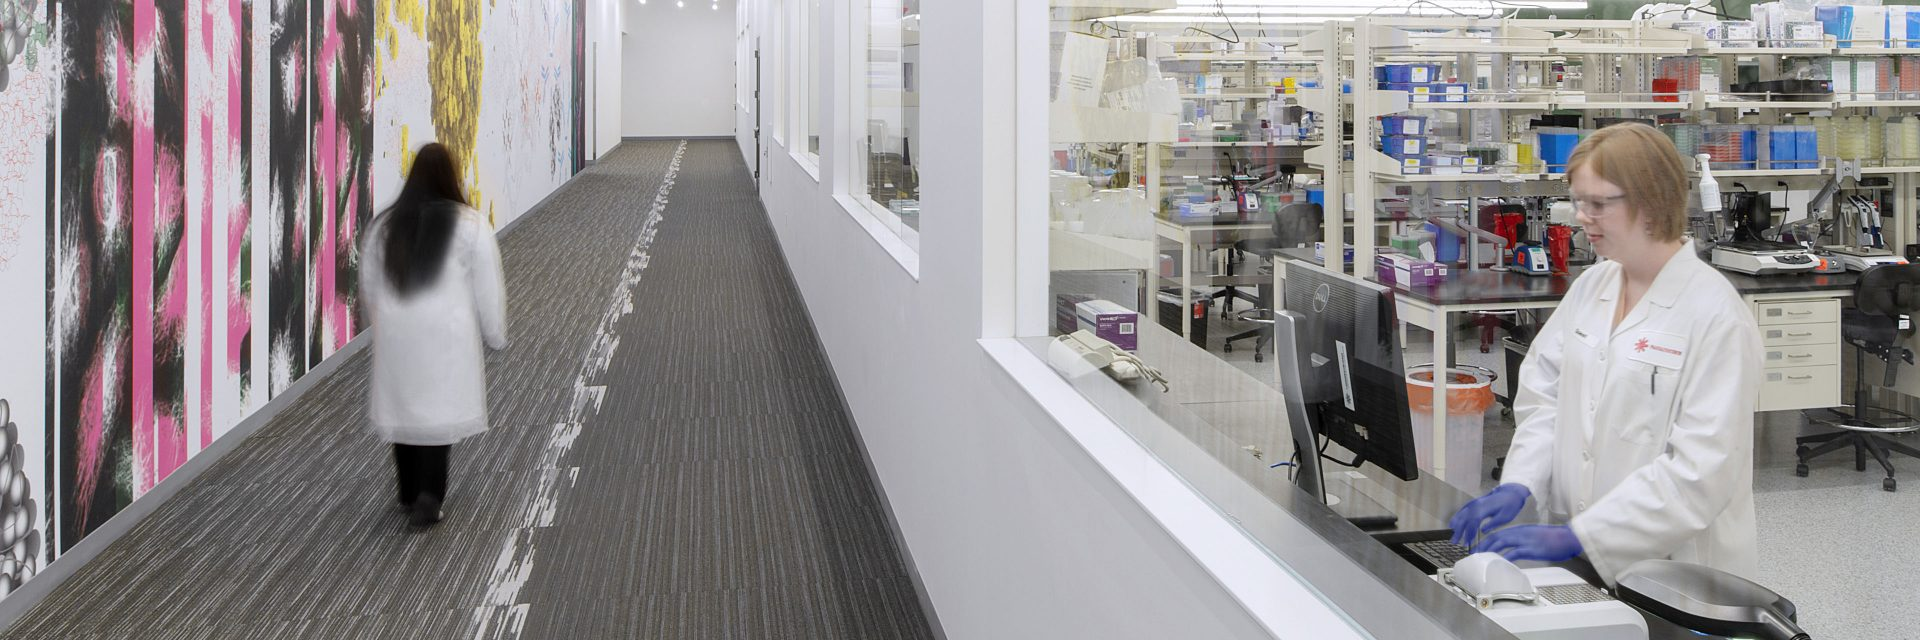 Looking inside a bioanalytical lab